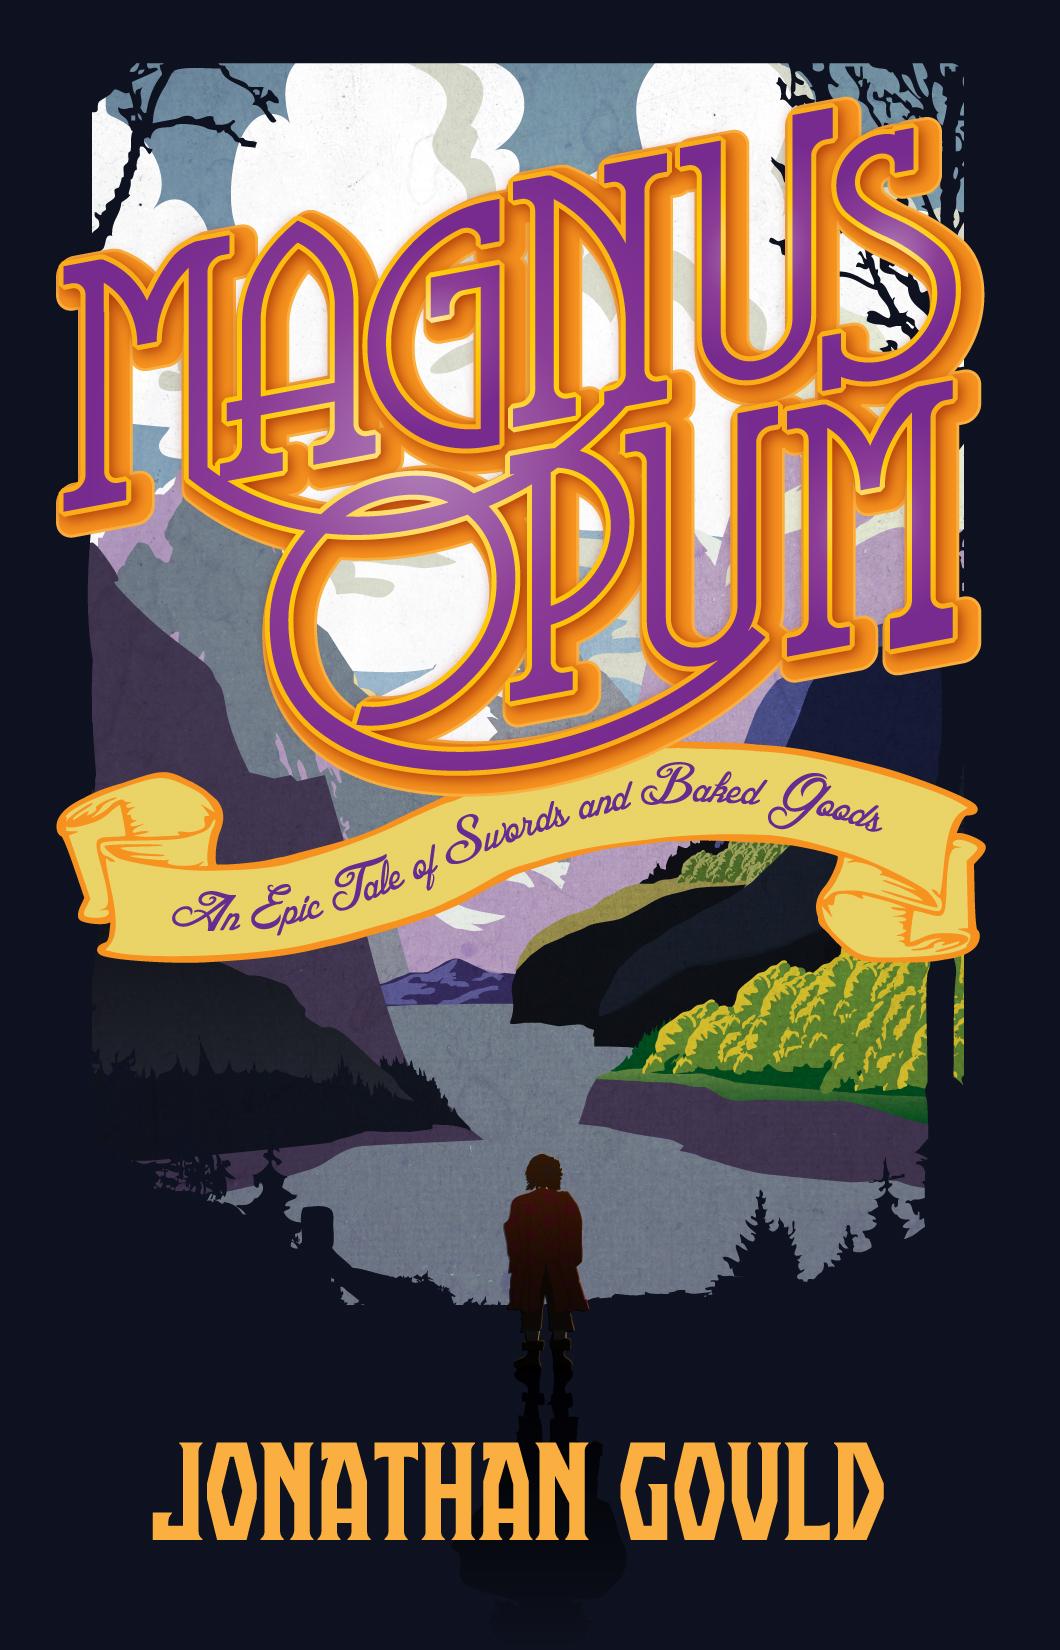 http://www.amazon.com/Magnus-Opum-Jonathan-Gould-ebook/dp/B00LP8YUBQ/